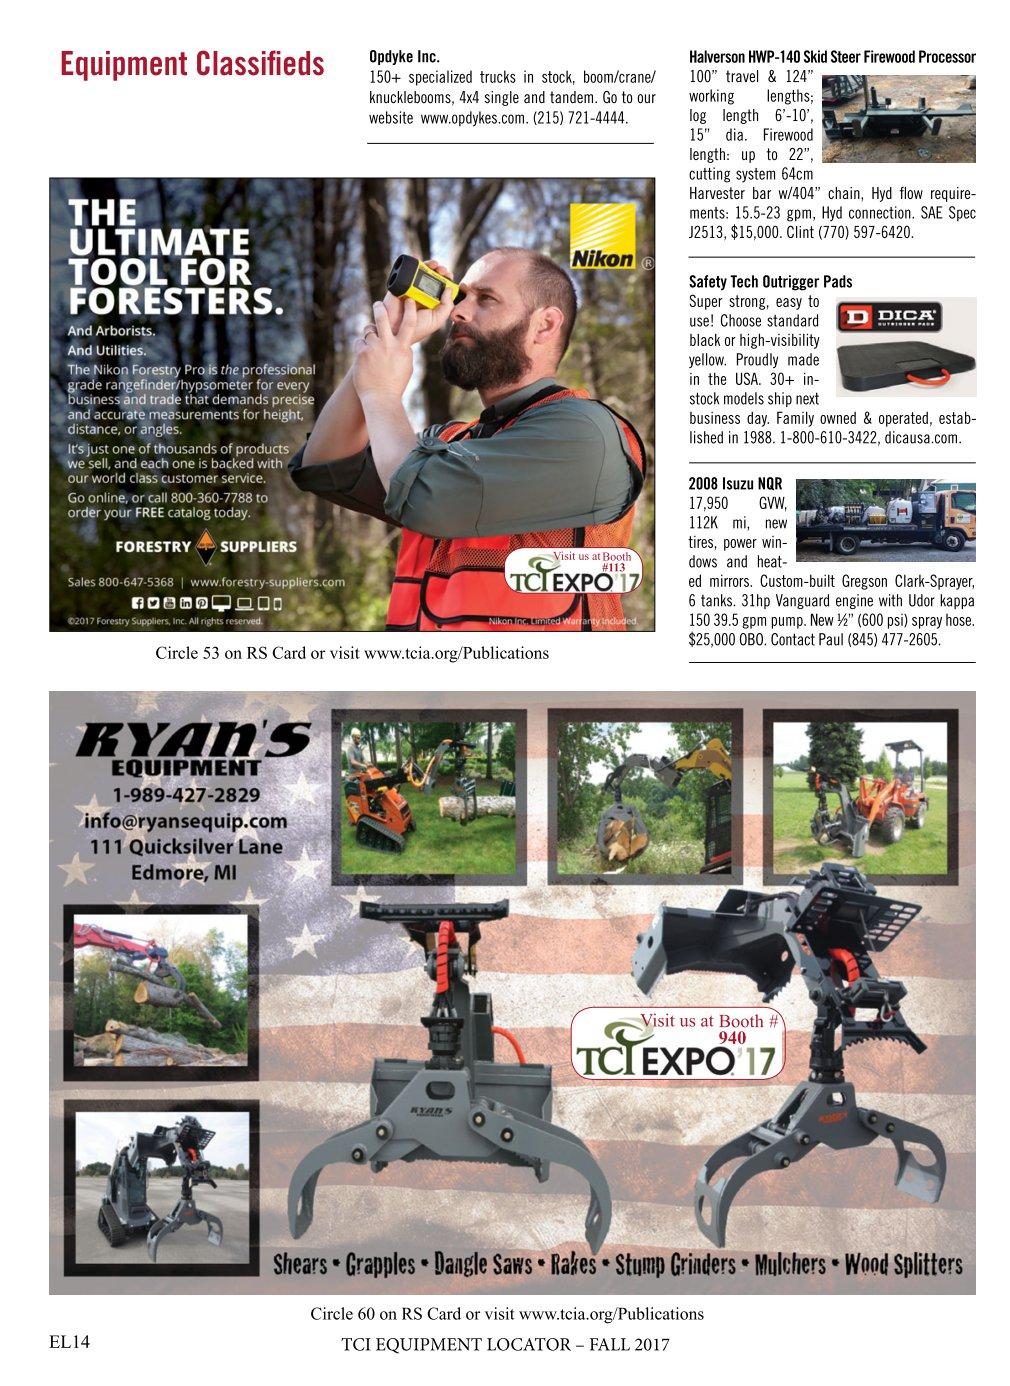 TCI Equipment Locator Fall 2017